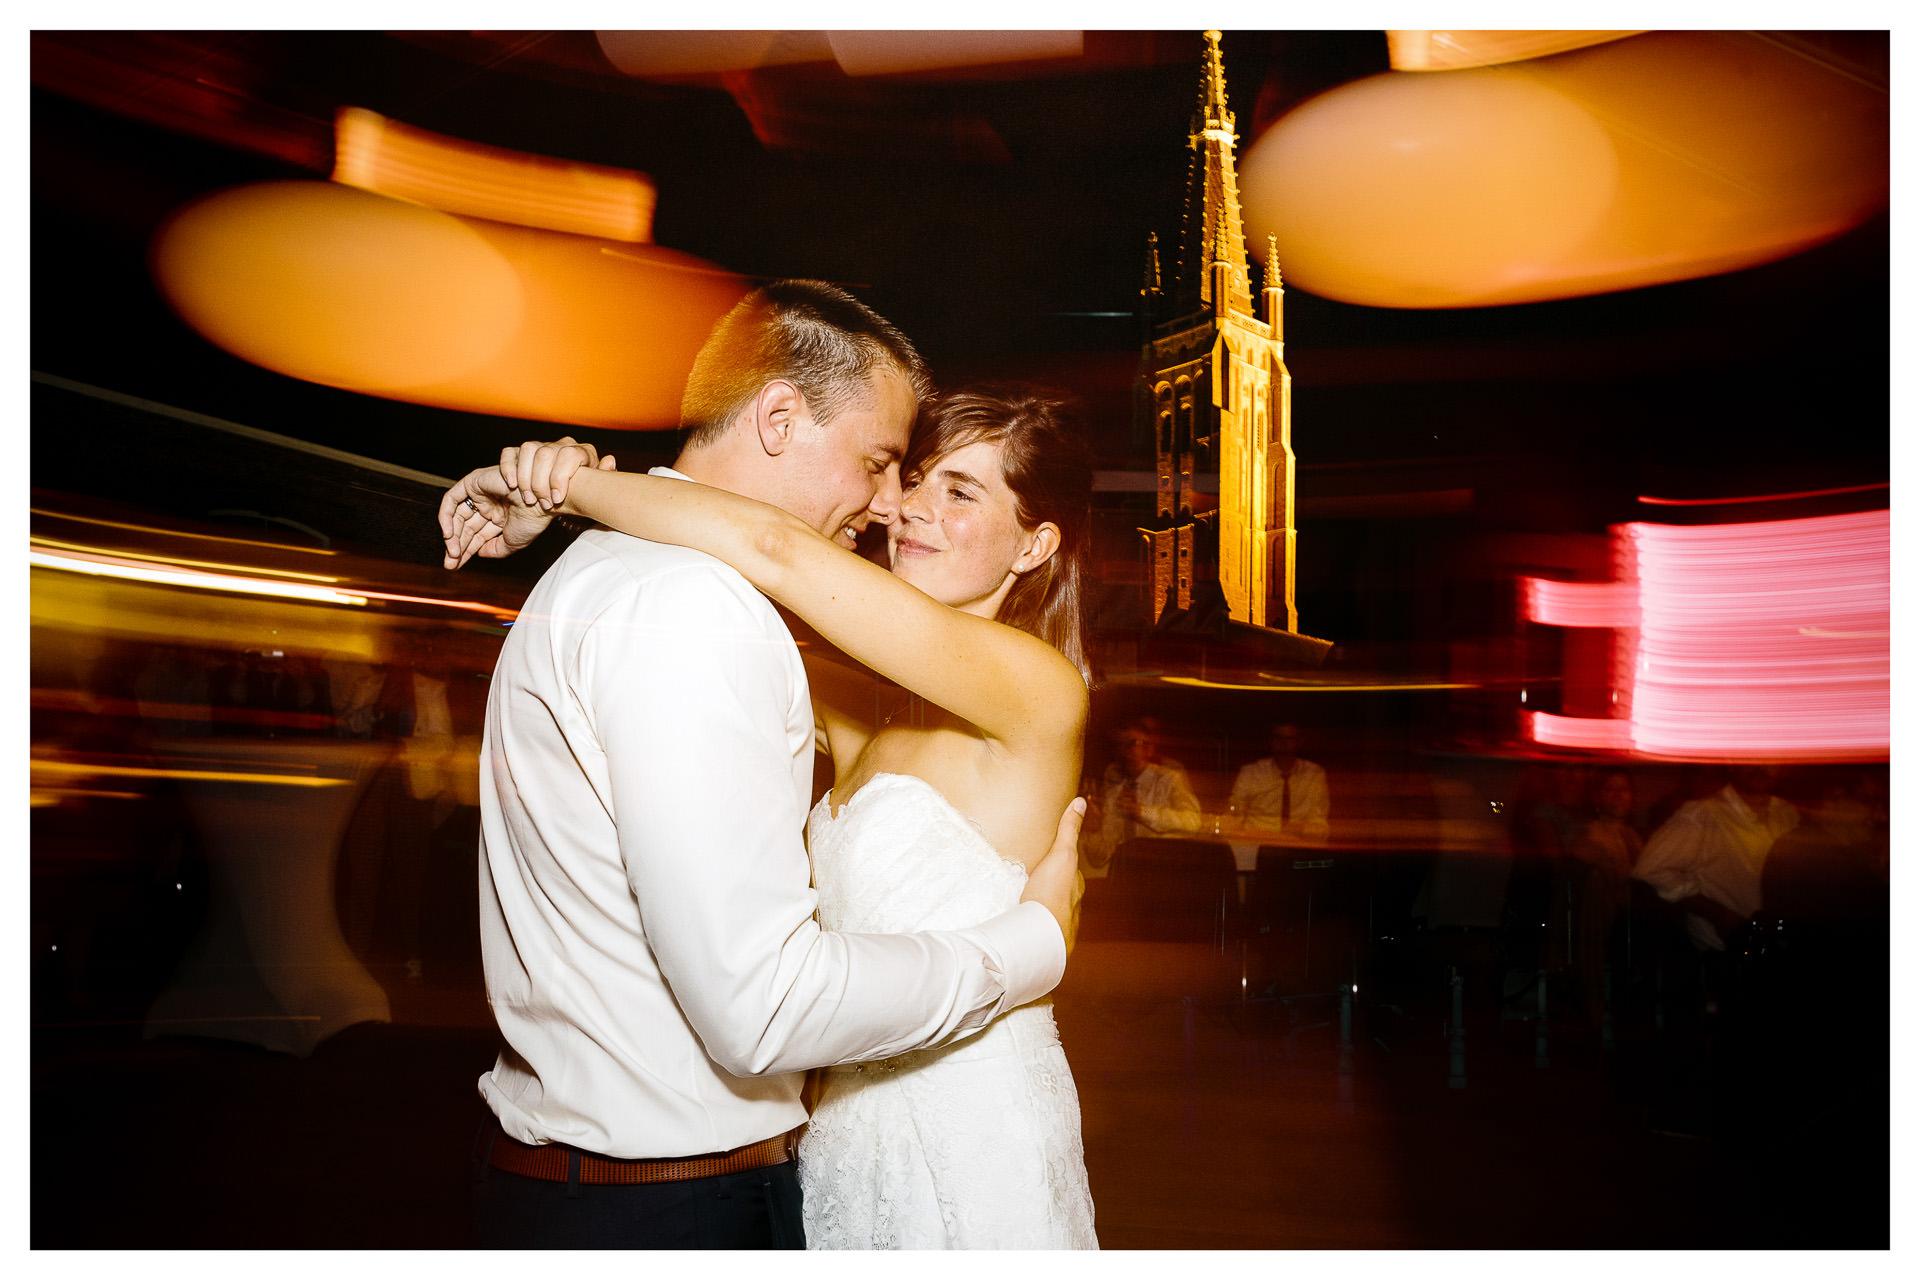 Huwelijksfotograaf B-IN Brugge